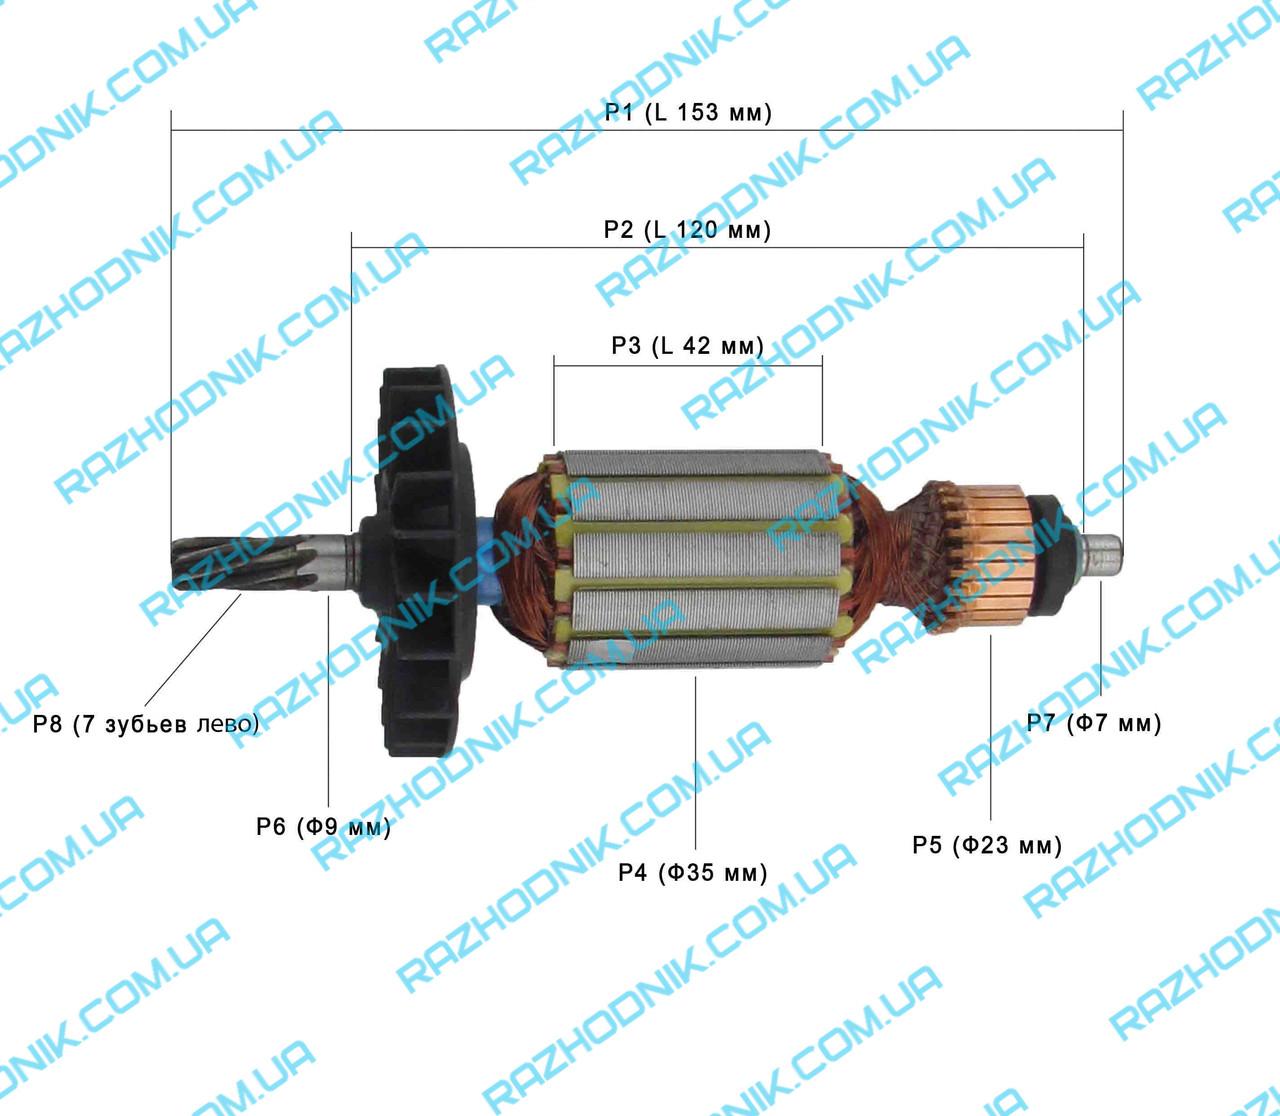 Якорь на перфоратор PowerСraft BH-1350 ДФР